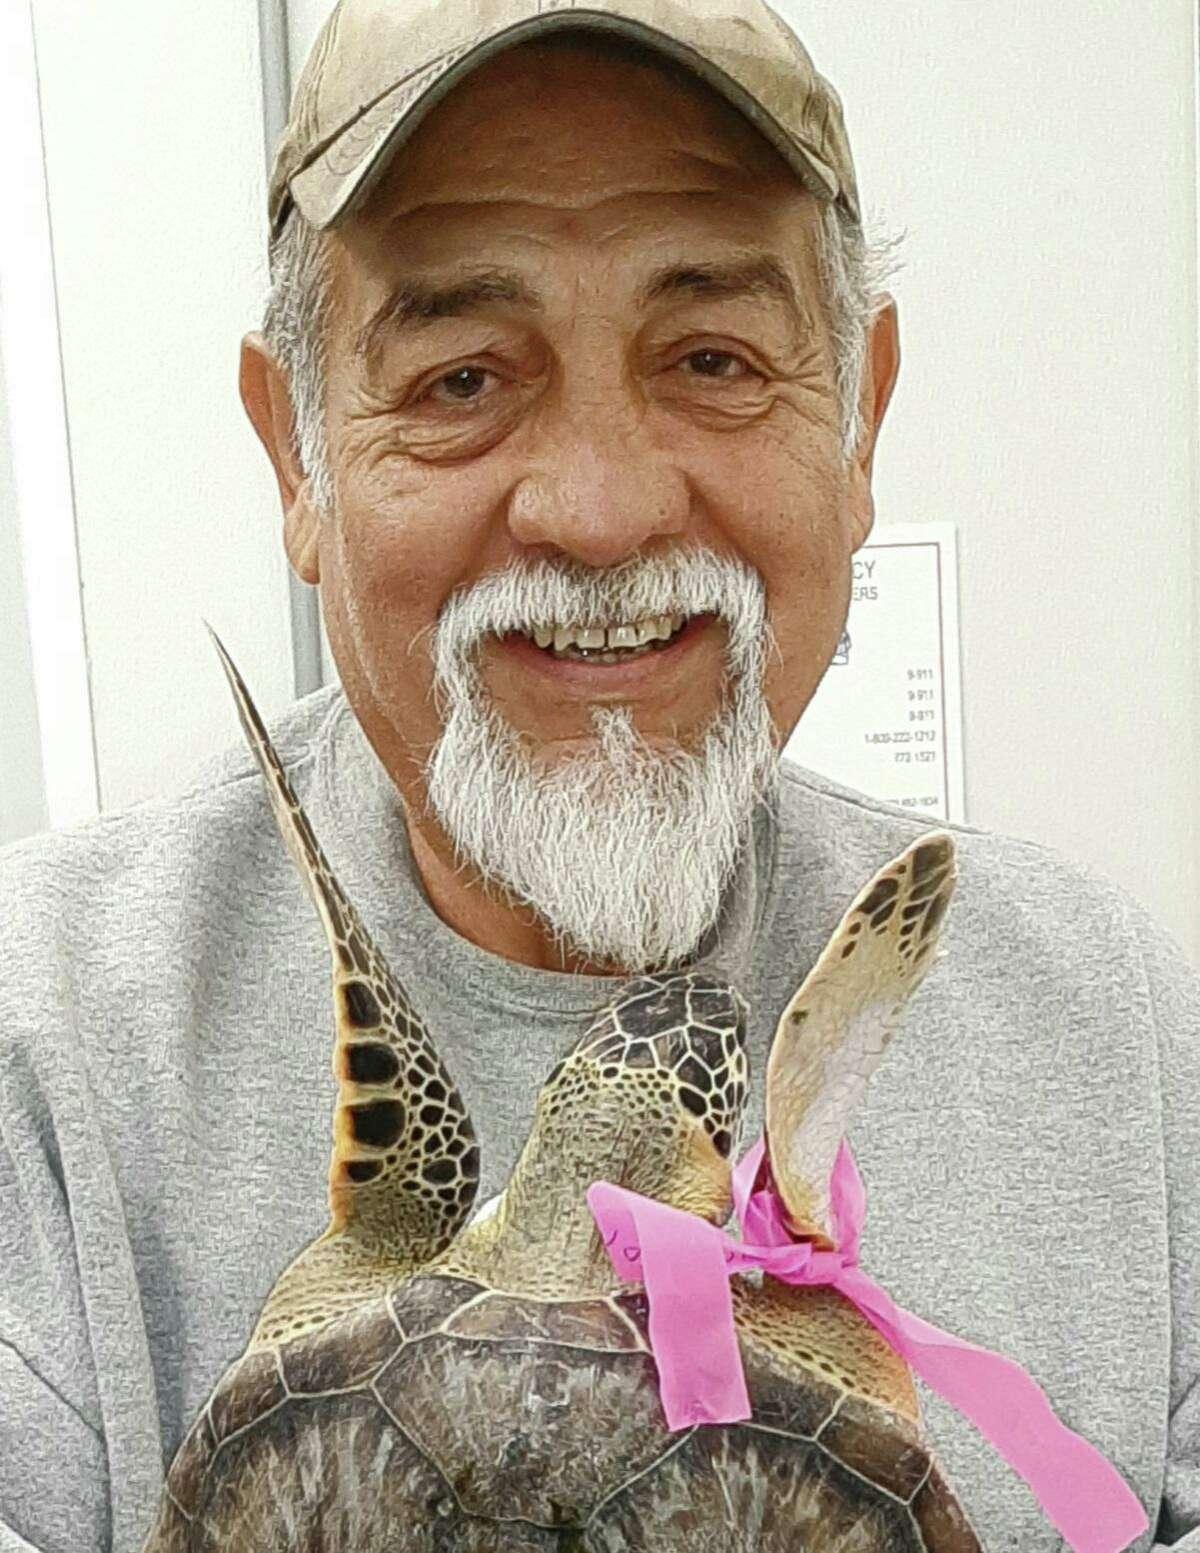 Carlos Rios gets a hug from a sea turtle.